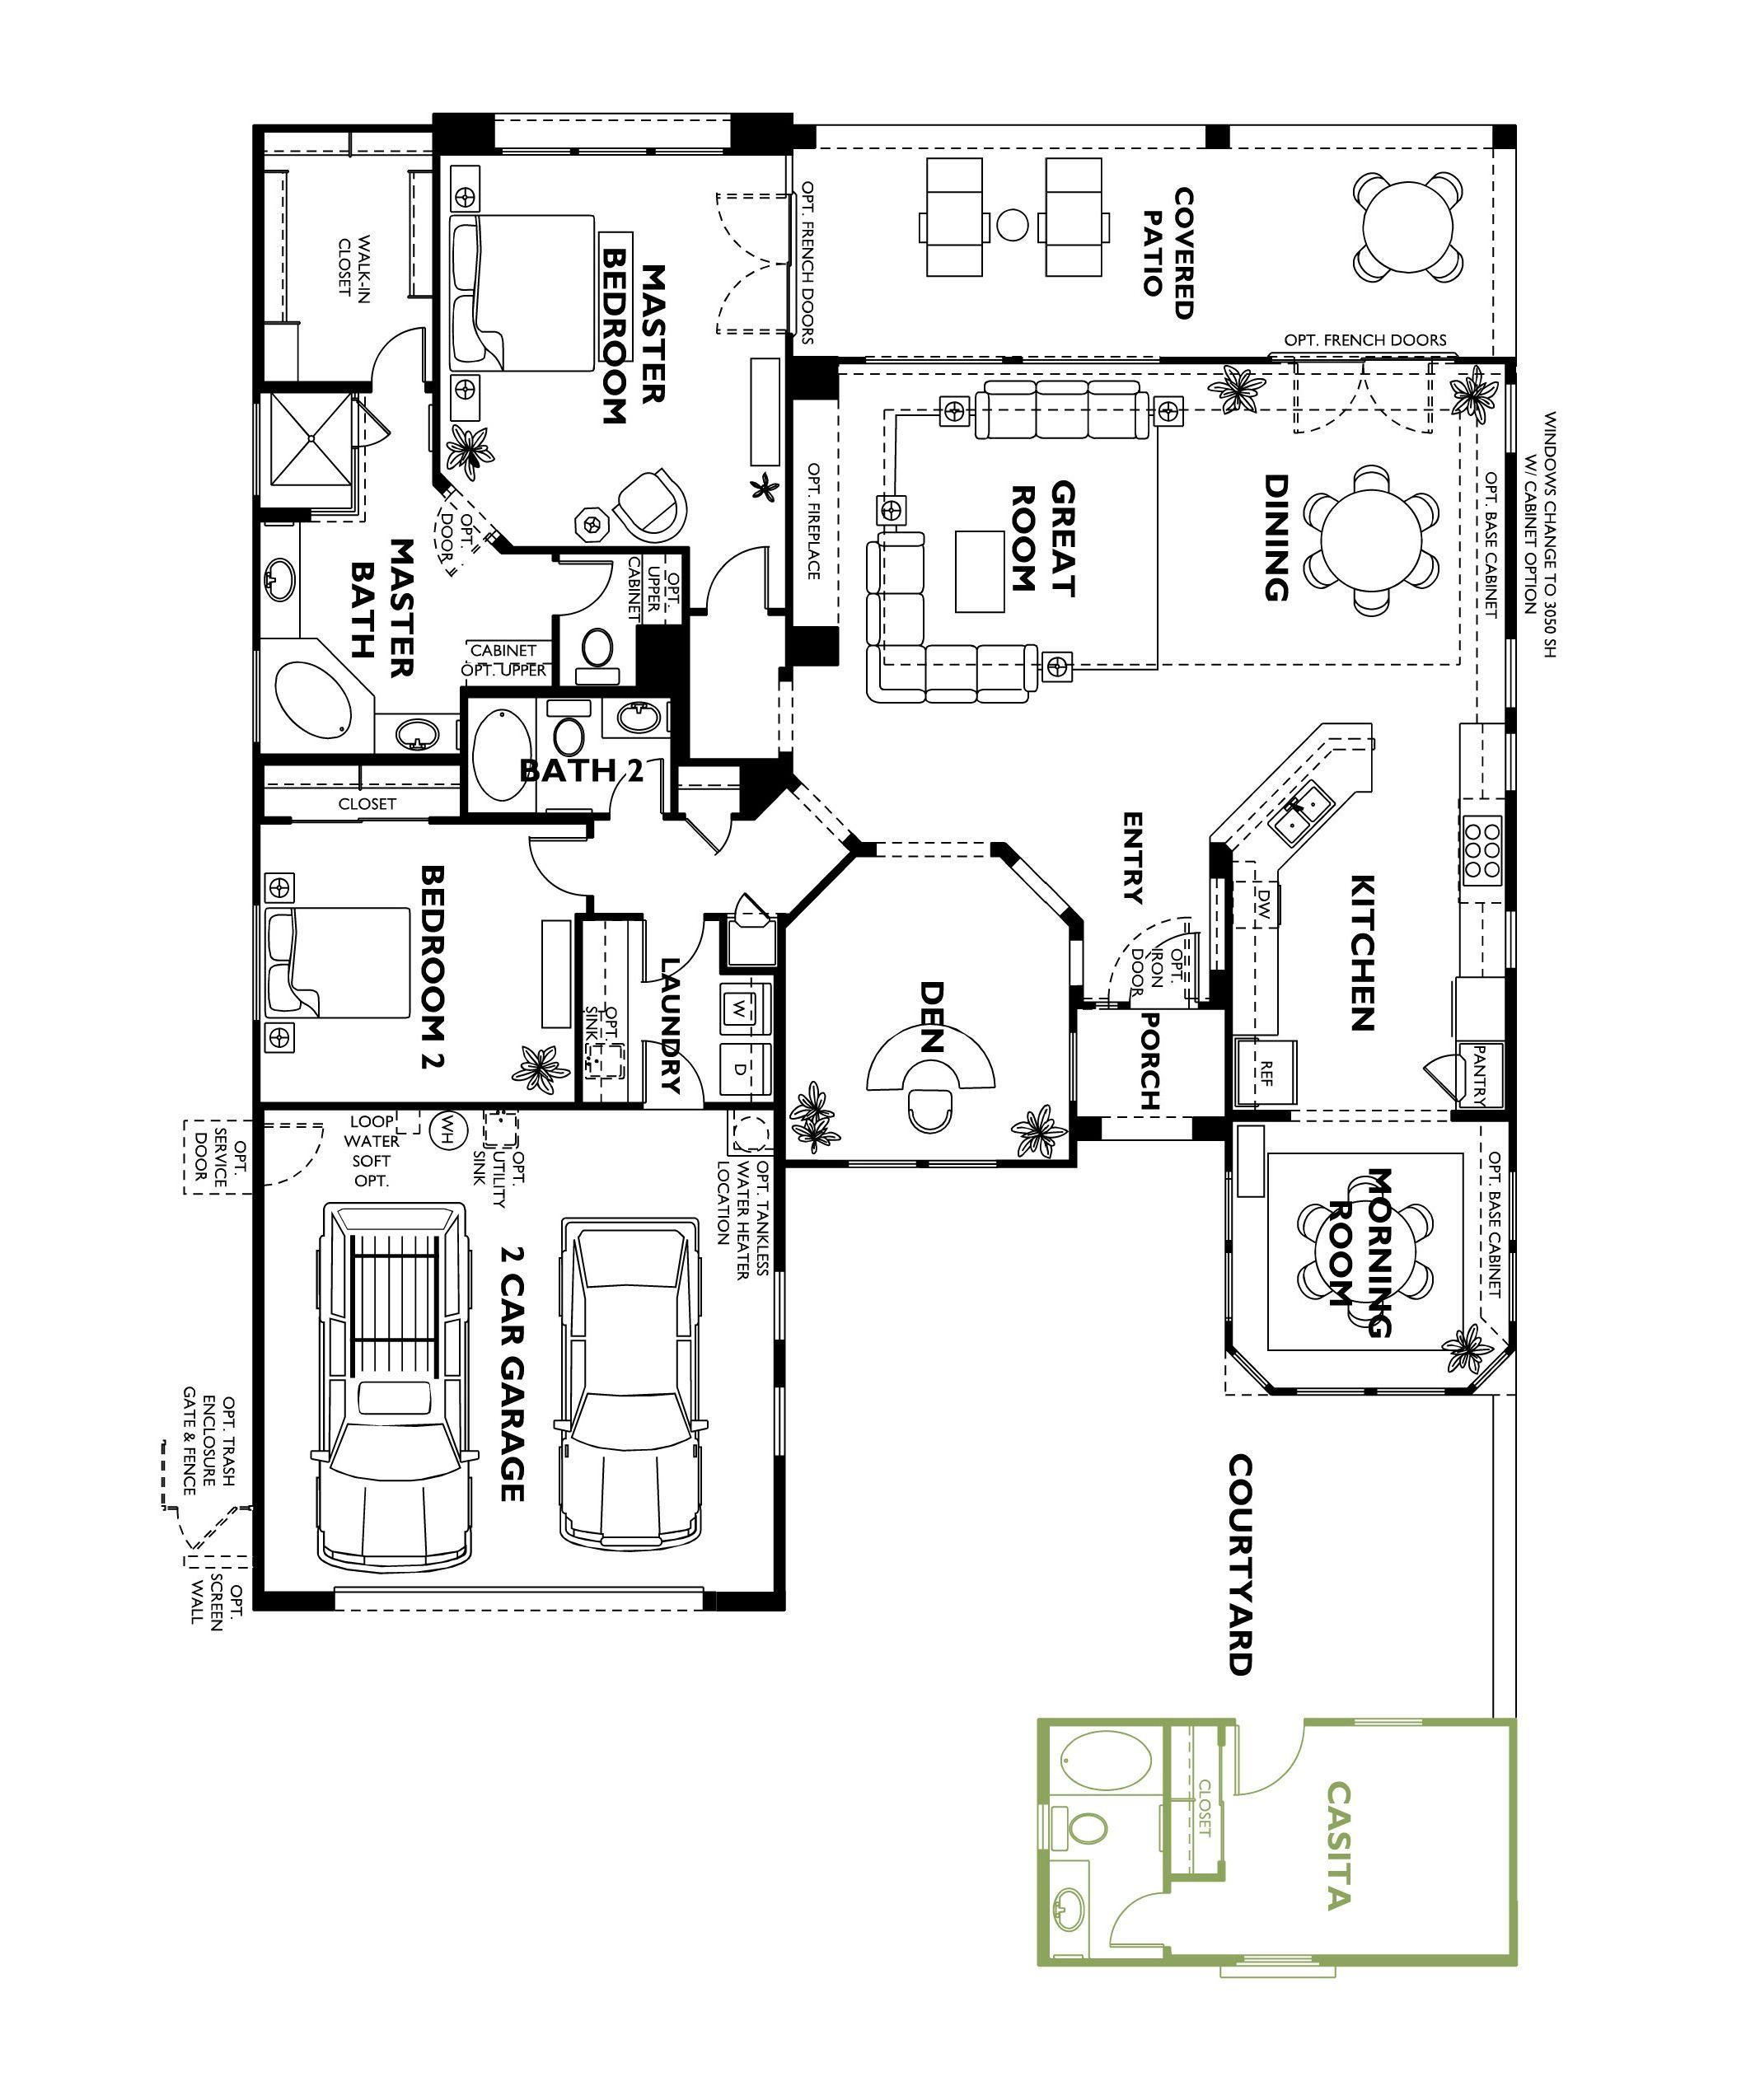 Trilogy At Vistancia Cadiz Floor Plan Model Home With